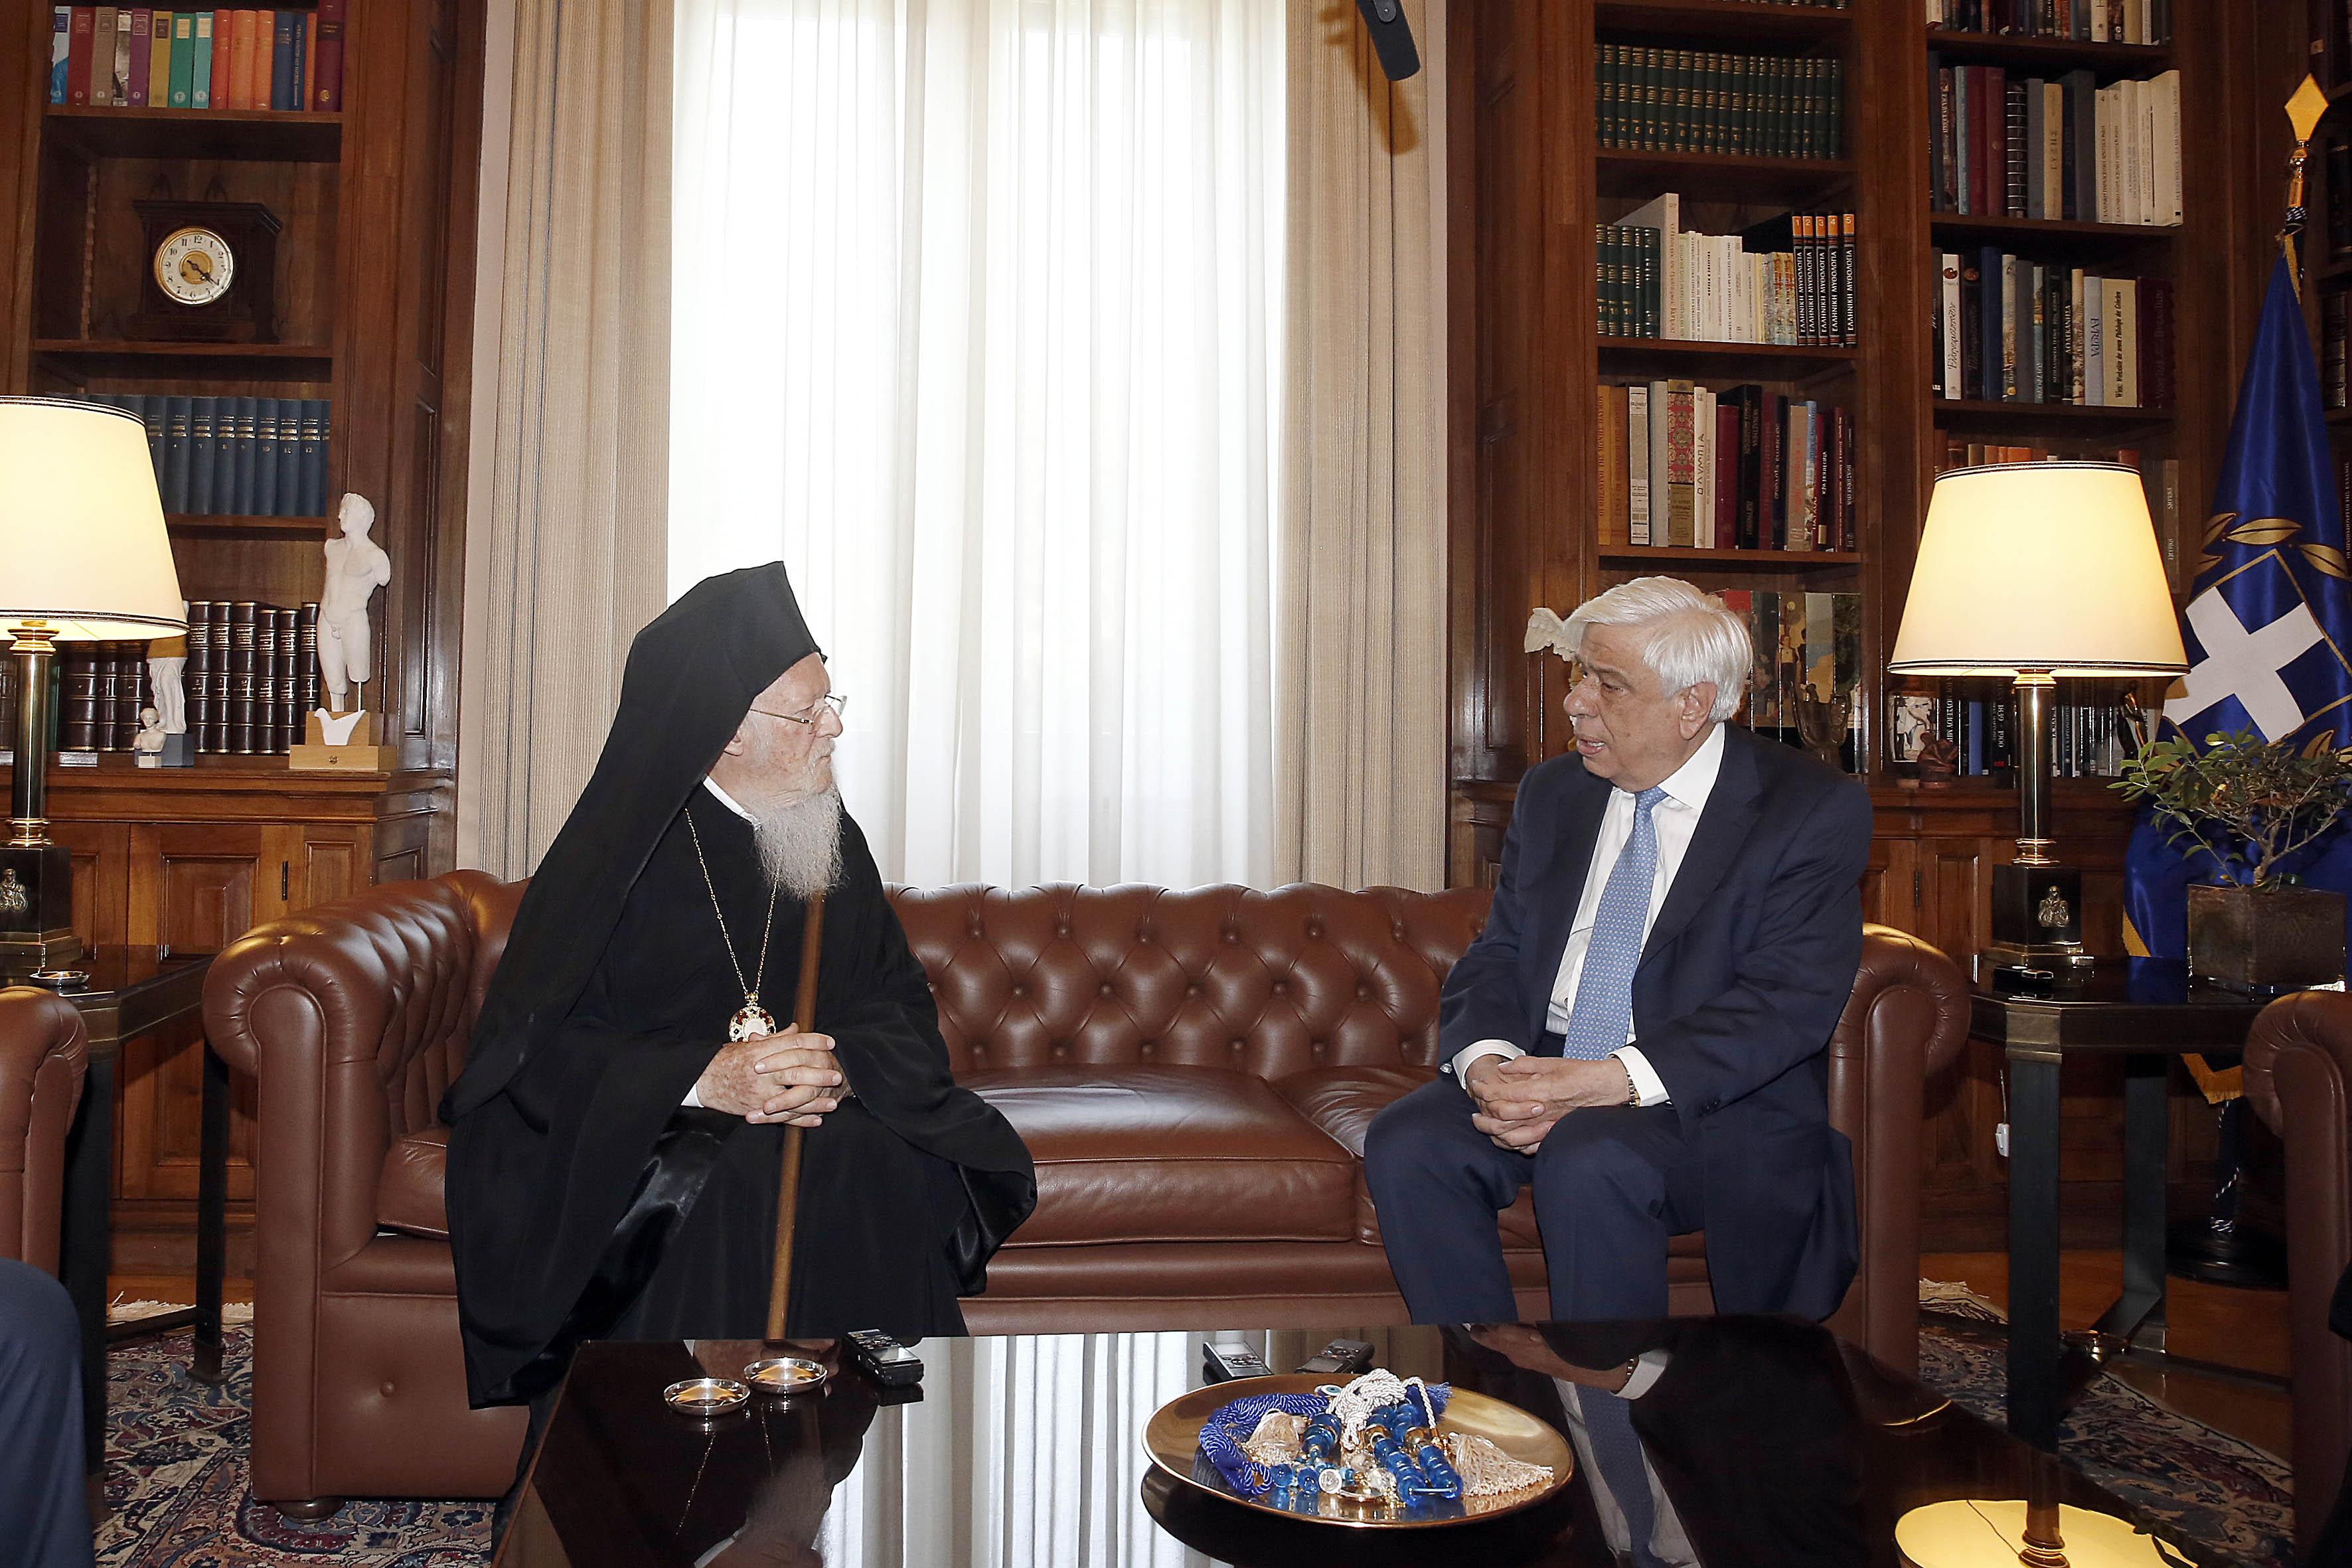 O Οικουμενικός Πατριάρχης κ. Βαρθολομαίος συναντήθηκε με τον Αρχιεπίσκοπο κ. Ιερώνυμο και τον ΠτΔ Προκόπη Παυλόπουλο